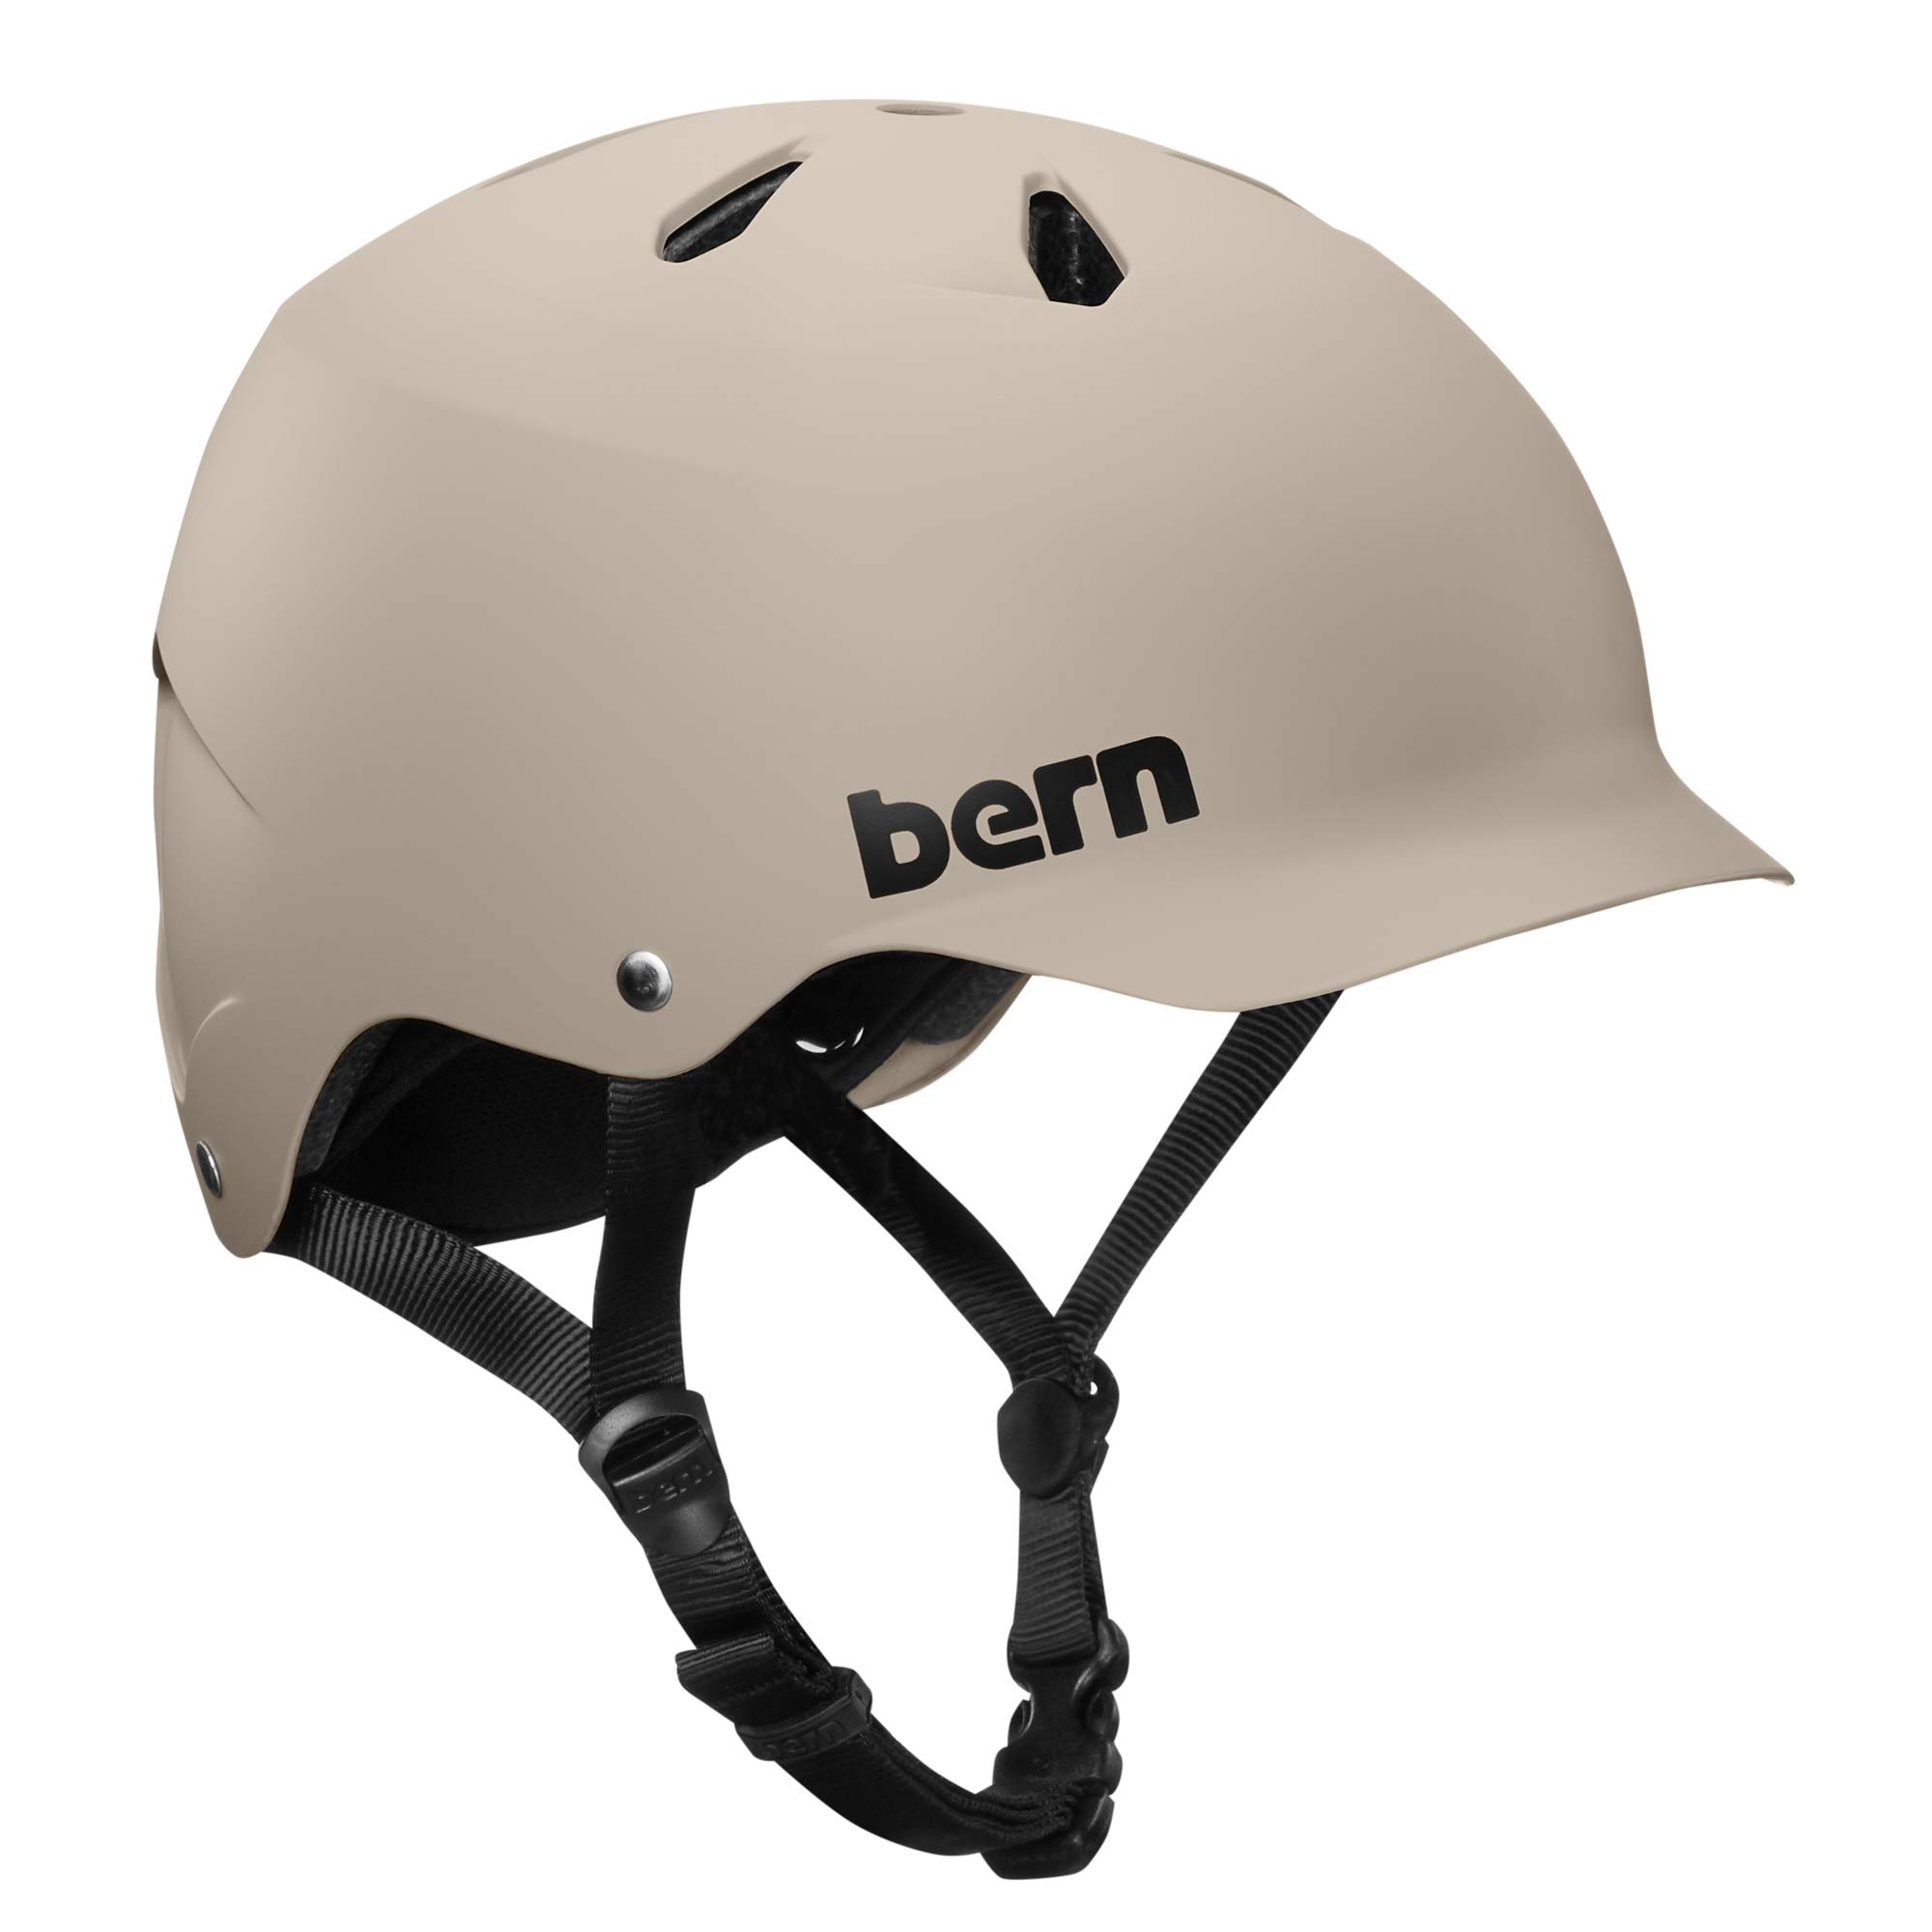 BERN - Summer Watts EPS Helmet, Matte Sand, Large by BERN